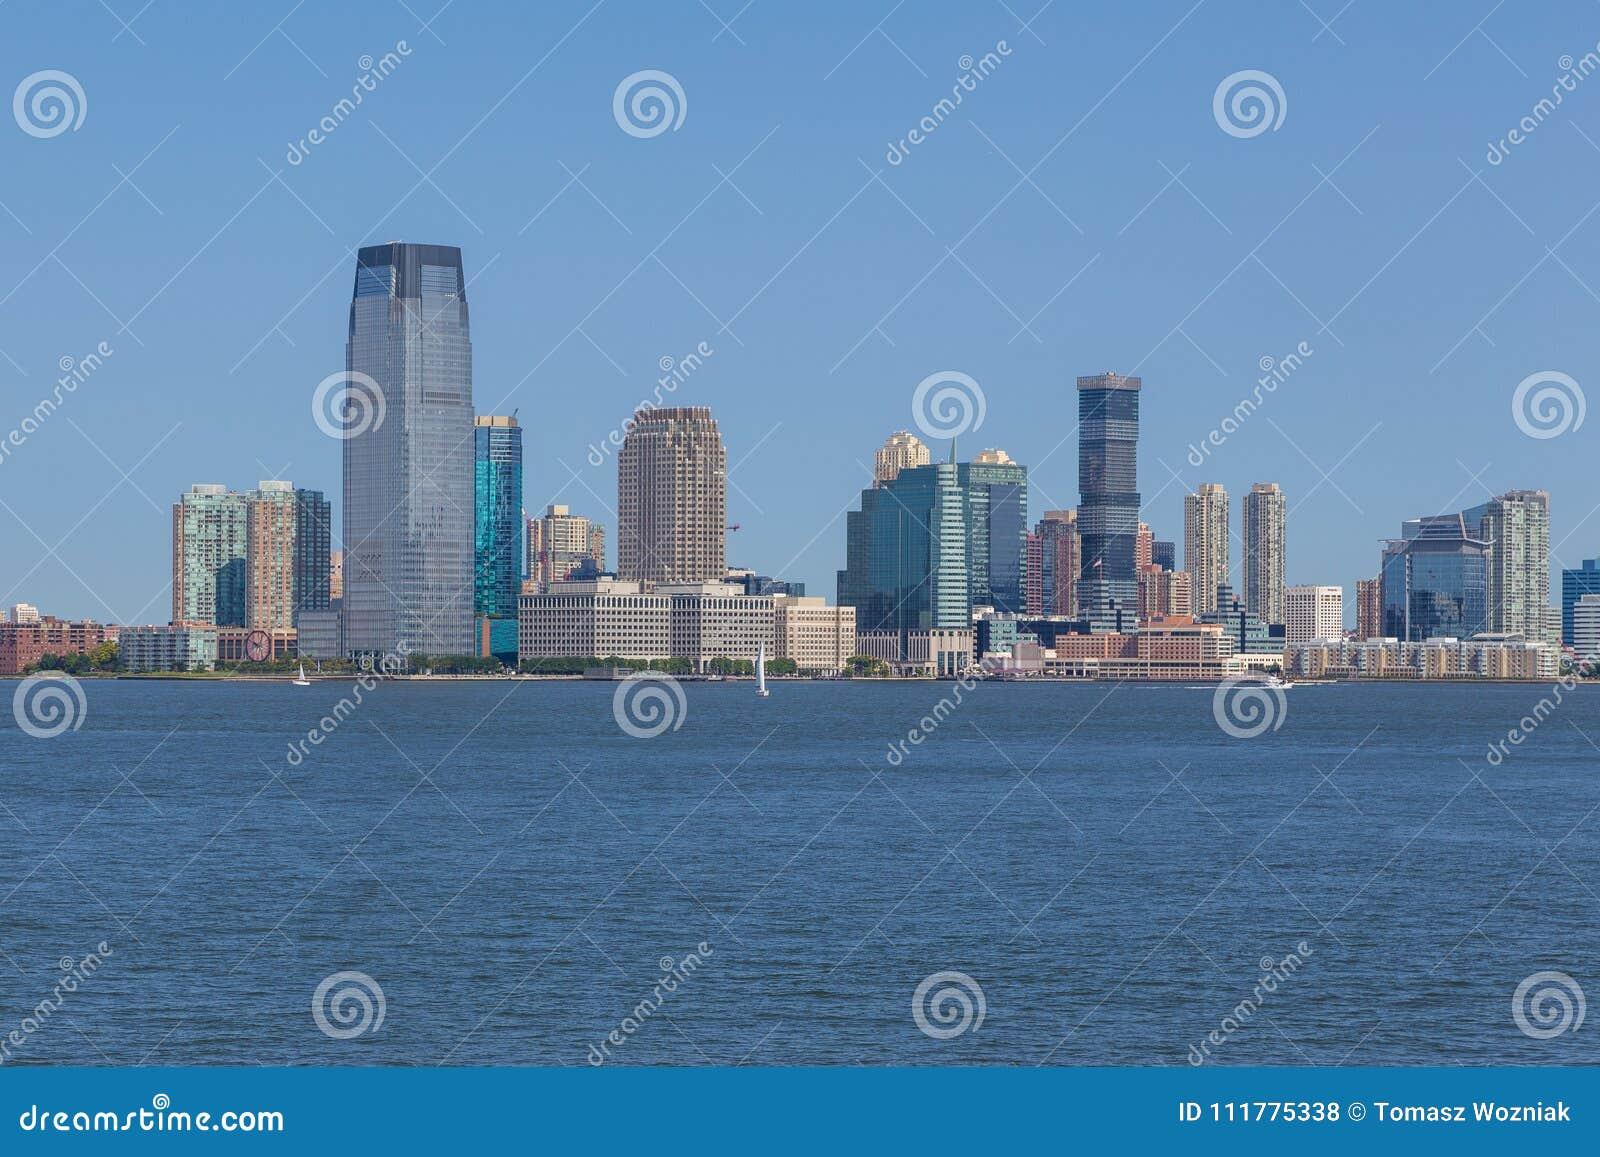 Panoramic view of New Jersey city skyline.